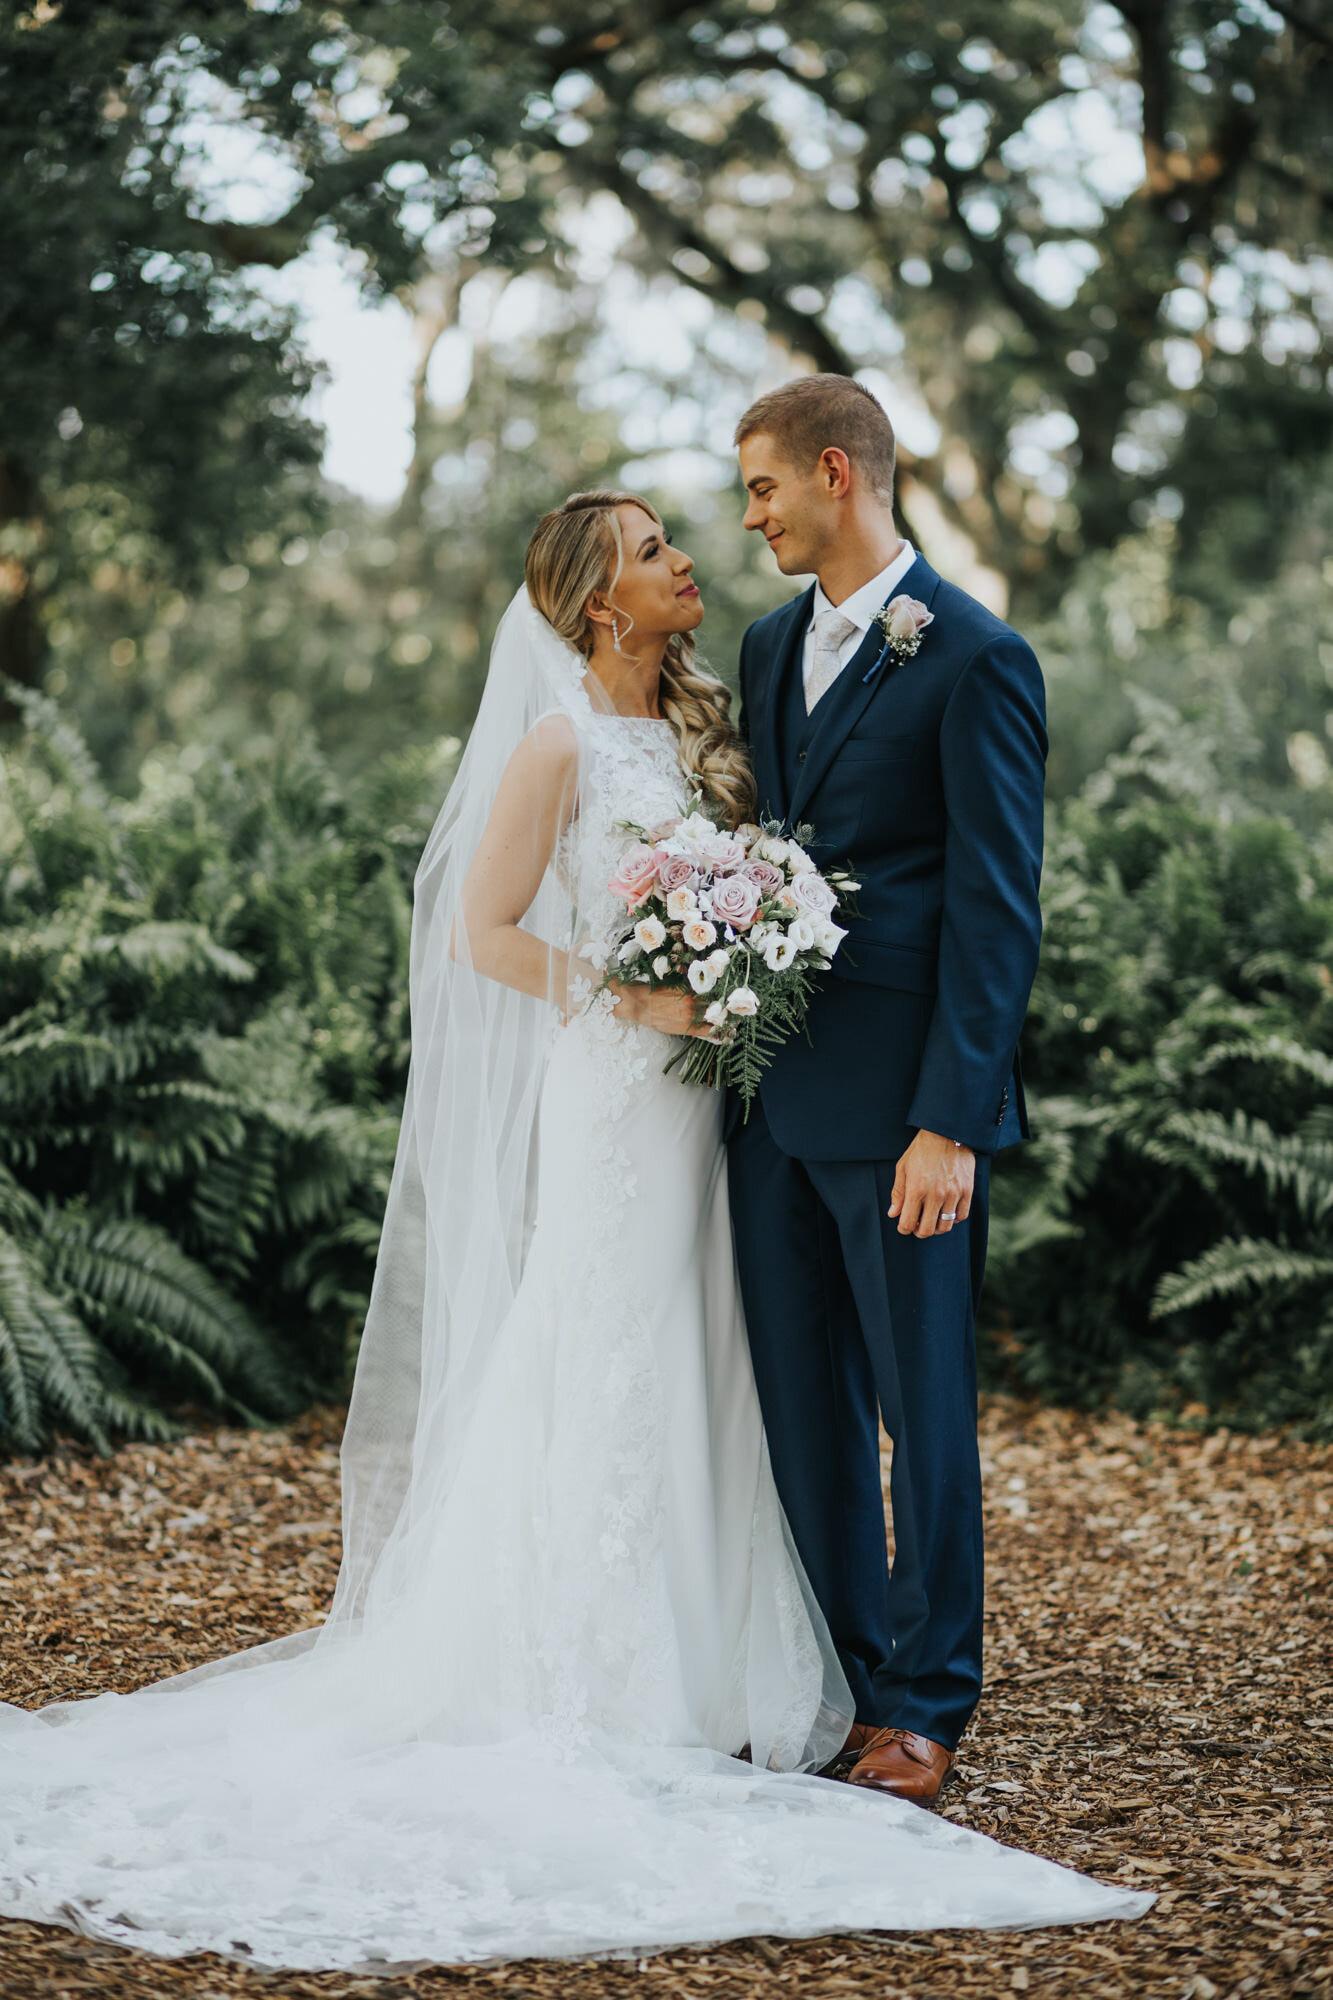 319Sean_Emily_Wedding_3-30-19.jpg